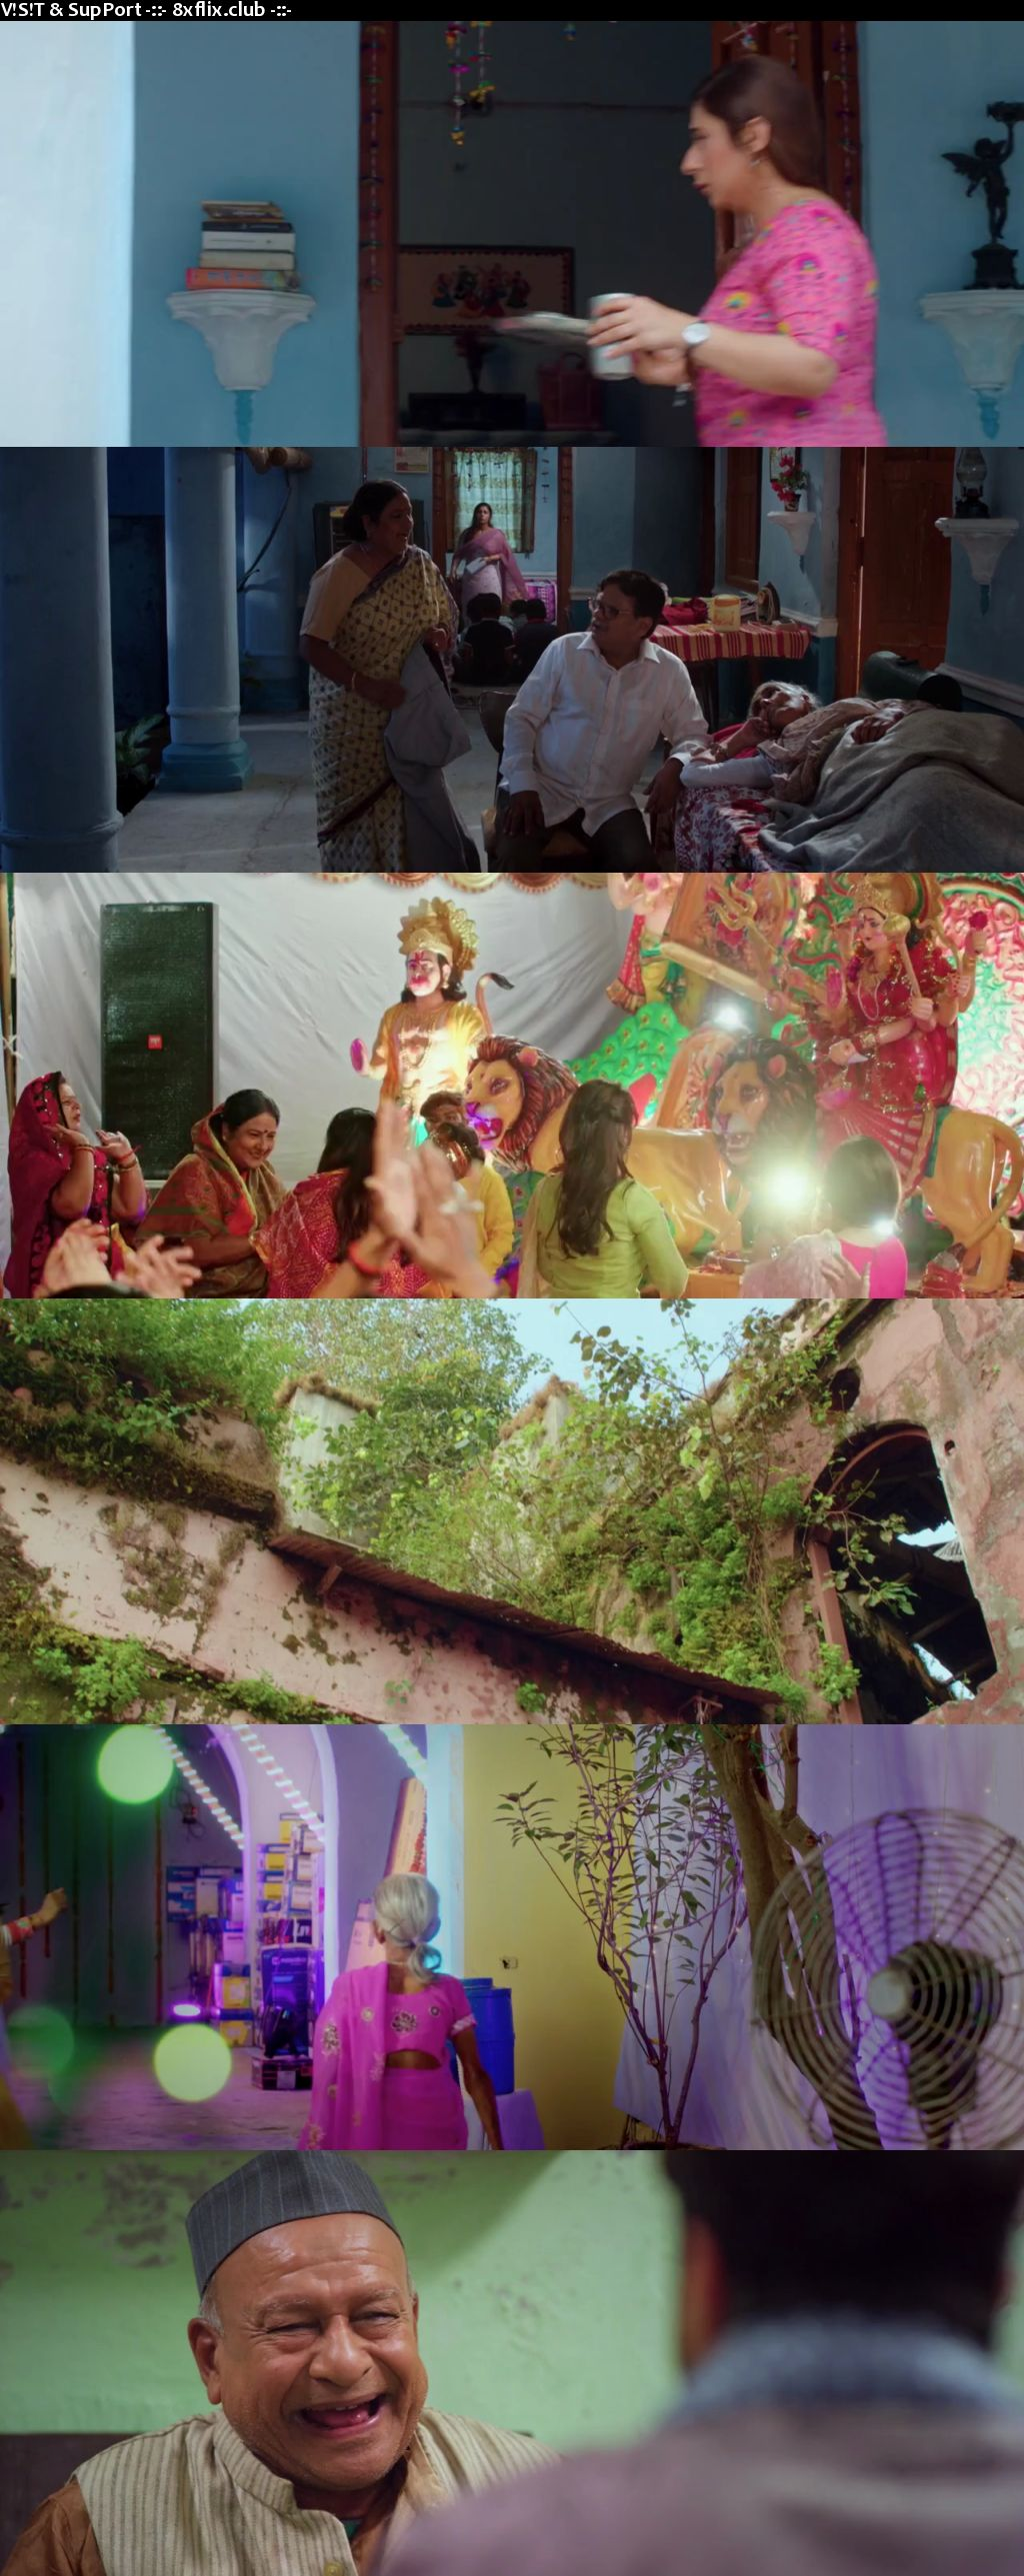 Kya Meri Sonam Gupta Bewafa Hai 2021 Full Hindi Movie Download 720p 480p Web-DL HD